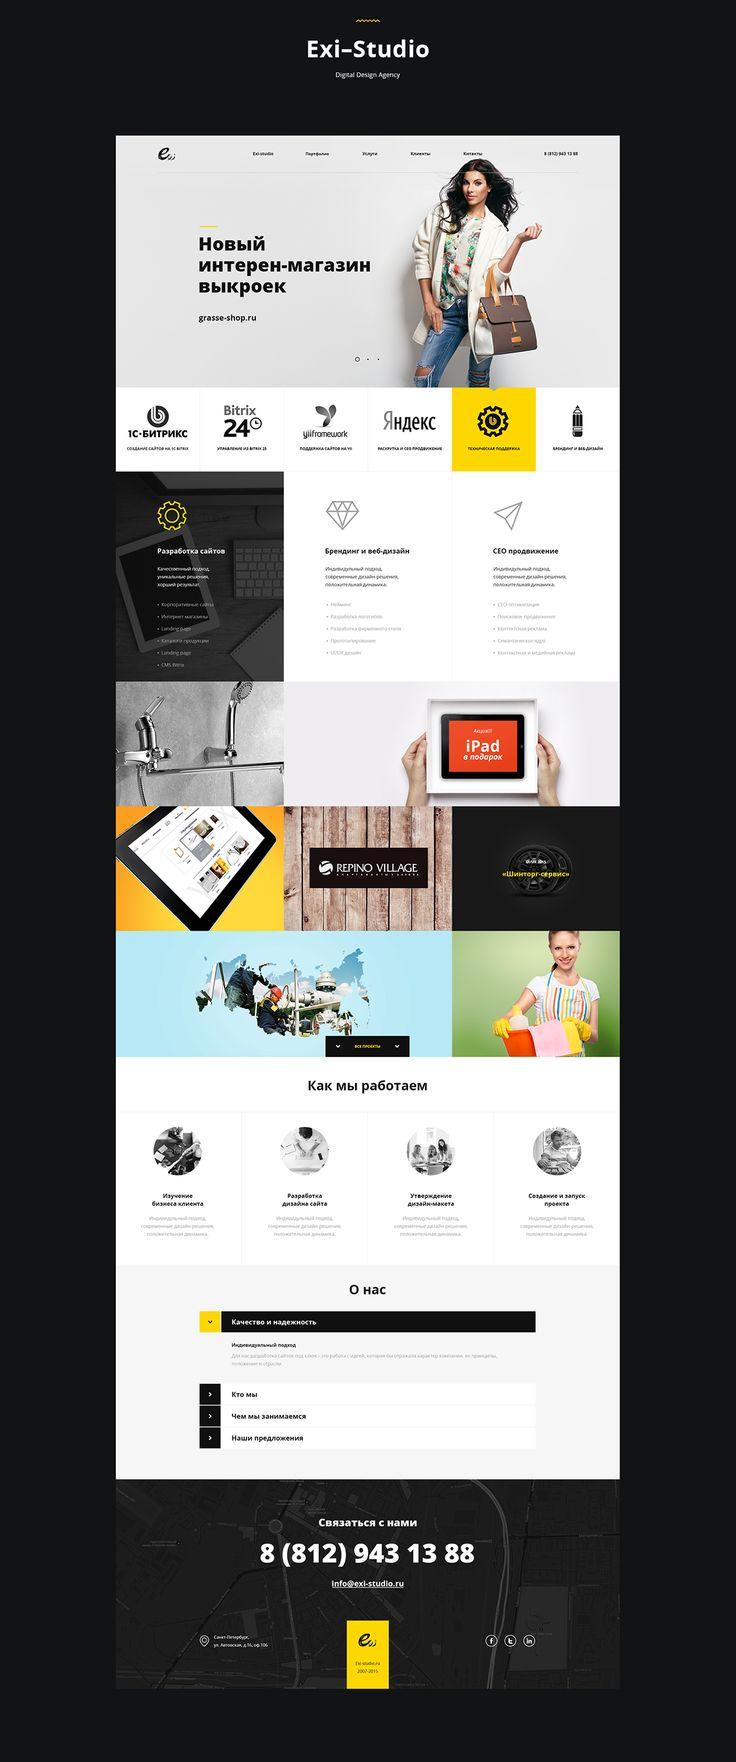 Website design 2015-2016 on Behance